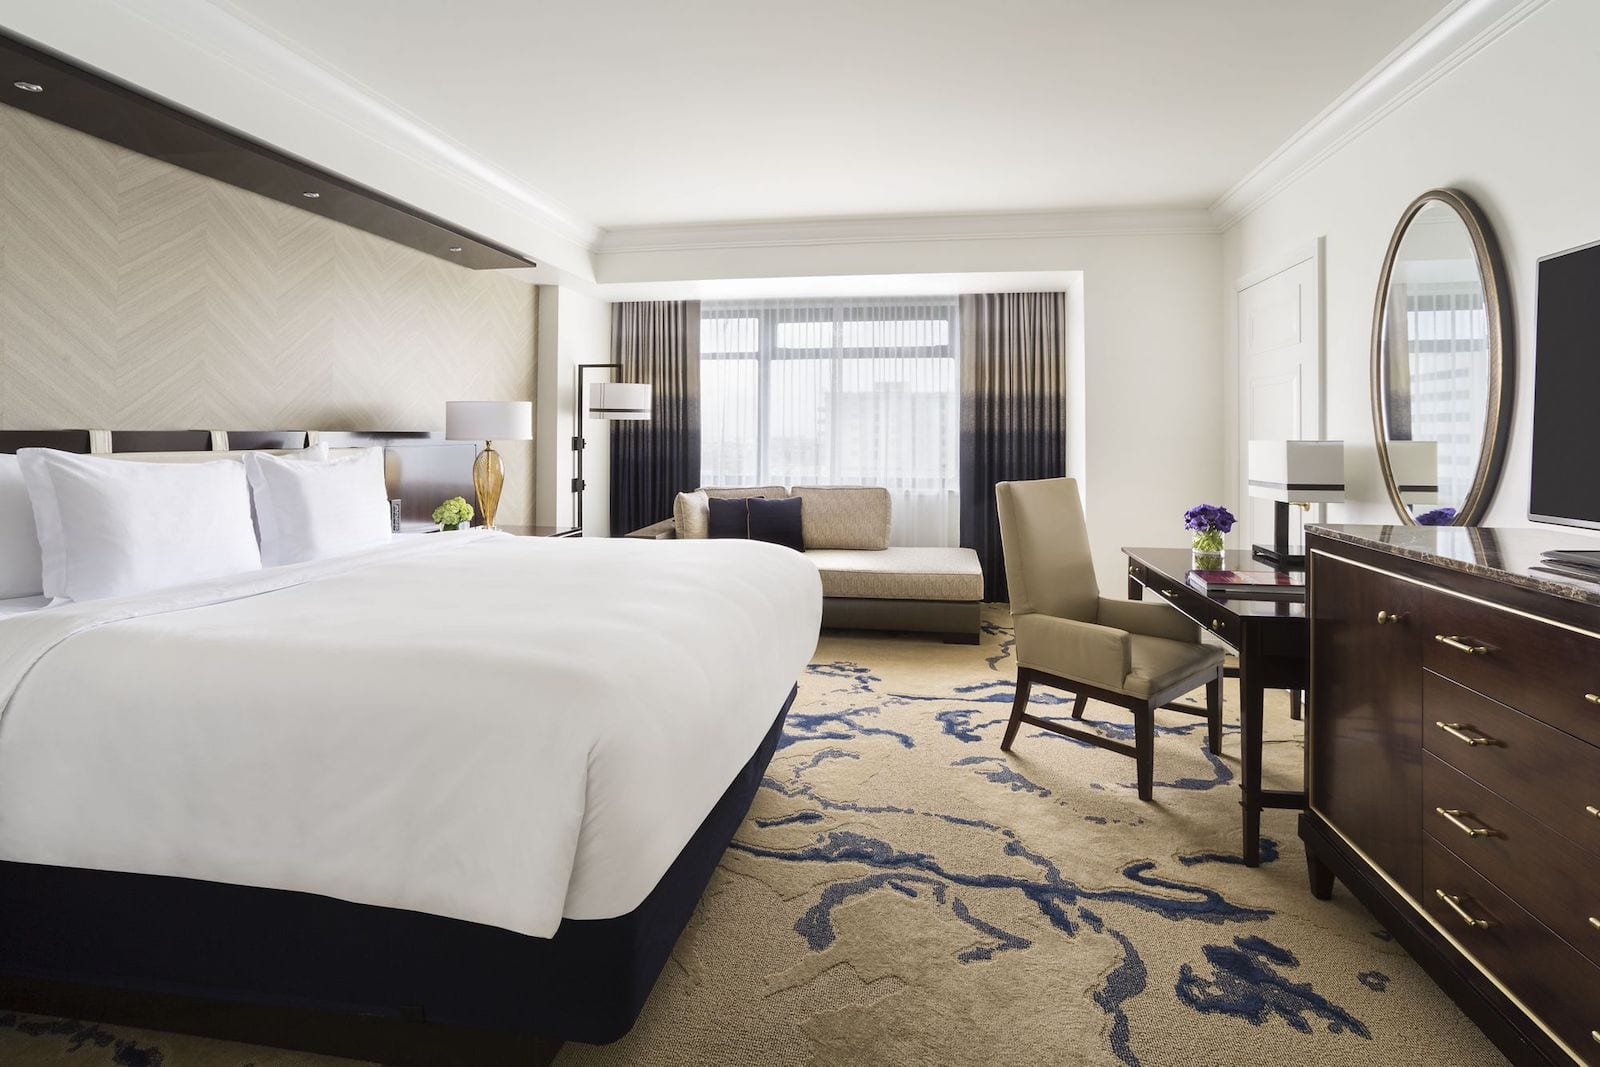 Ritz-Carlton Denver Hotel King Room